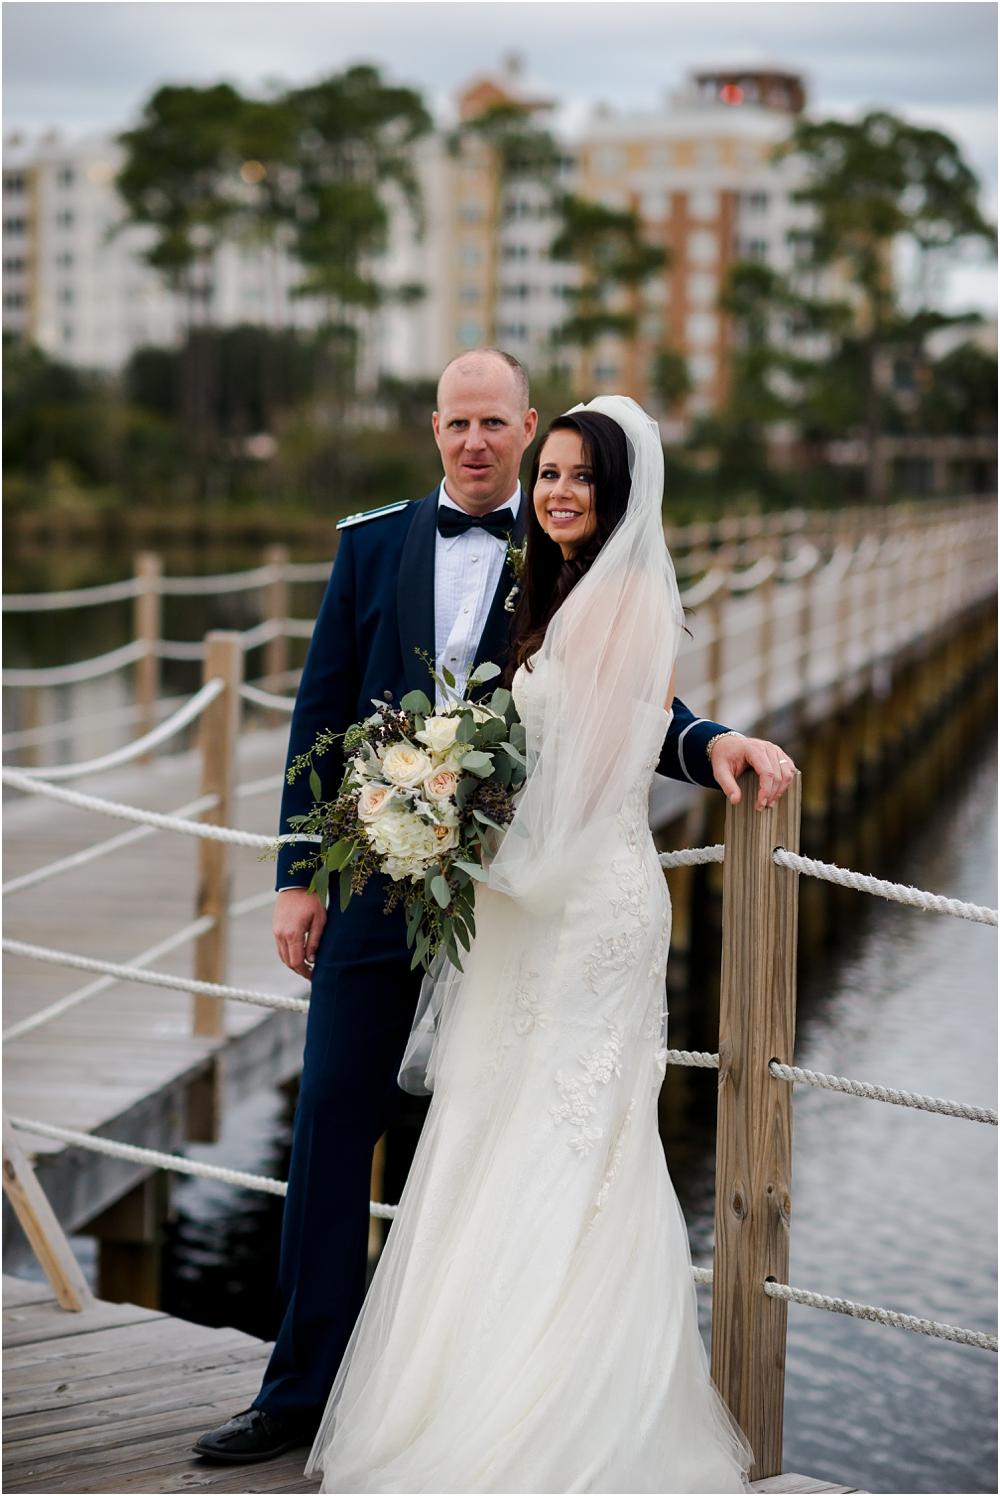 quinn-bay-point-sheraton-florida-wedding-photographer-kiersten-grant-88.jpg